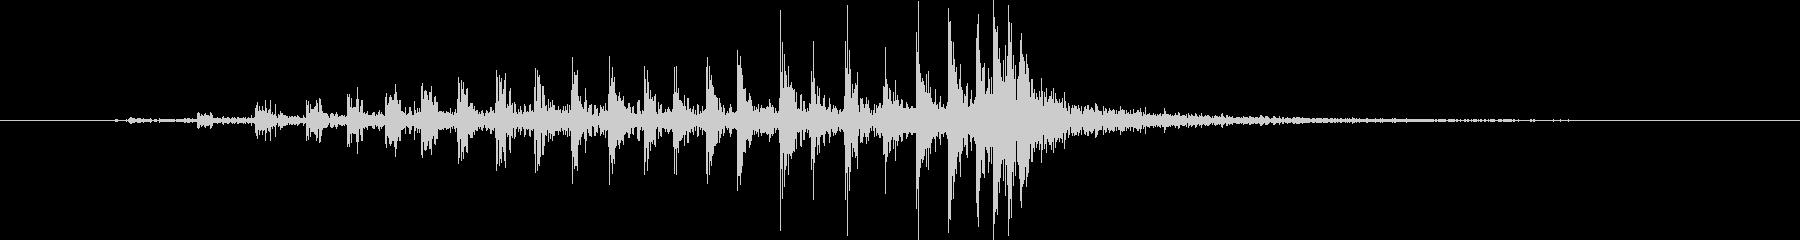 GUIRO、シングルスクラップ2の未再生の波形